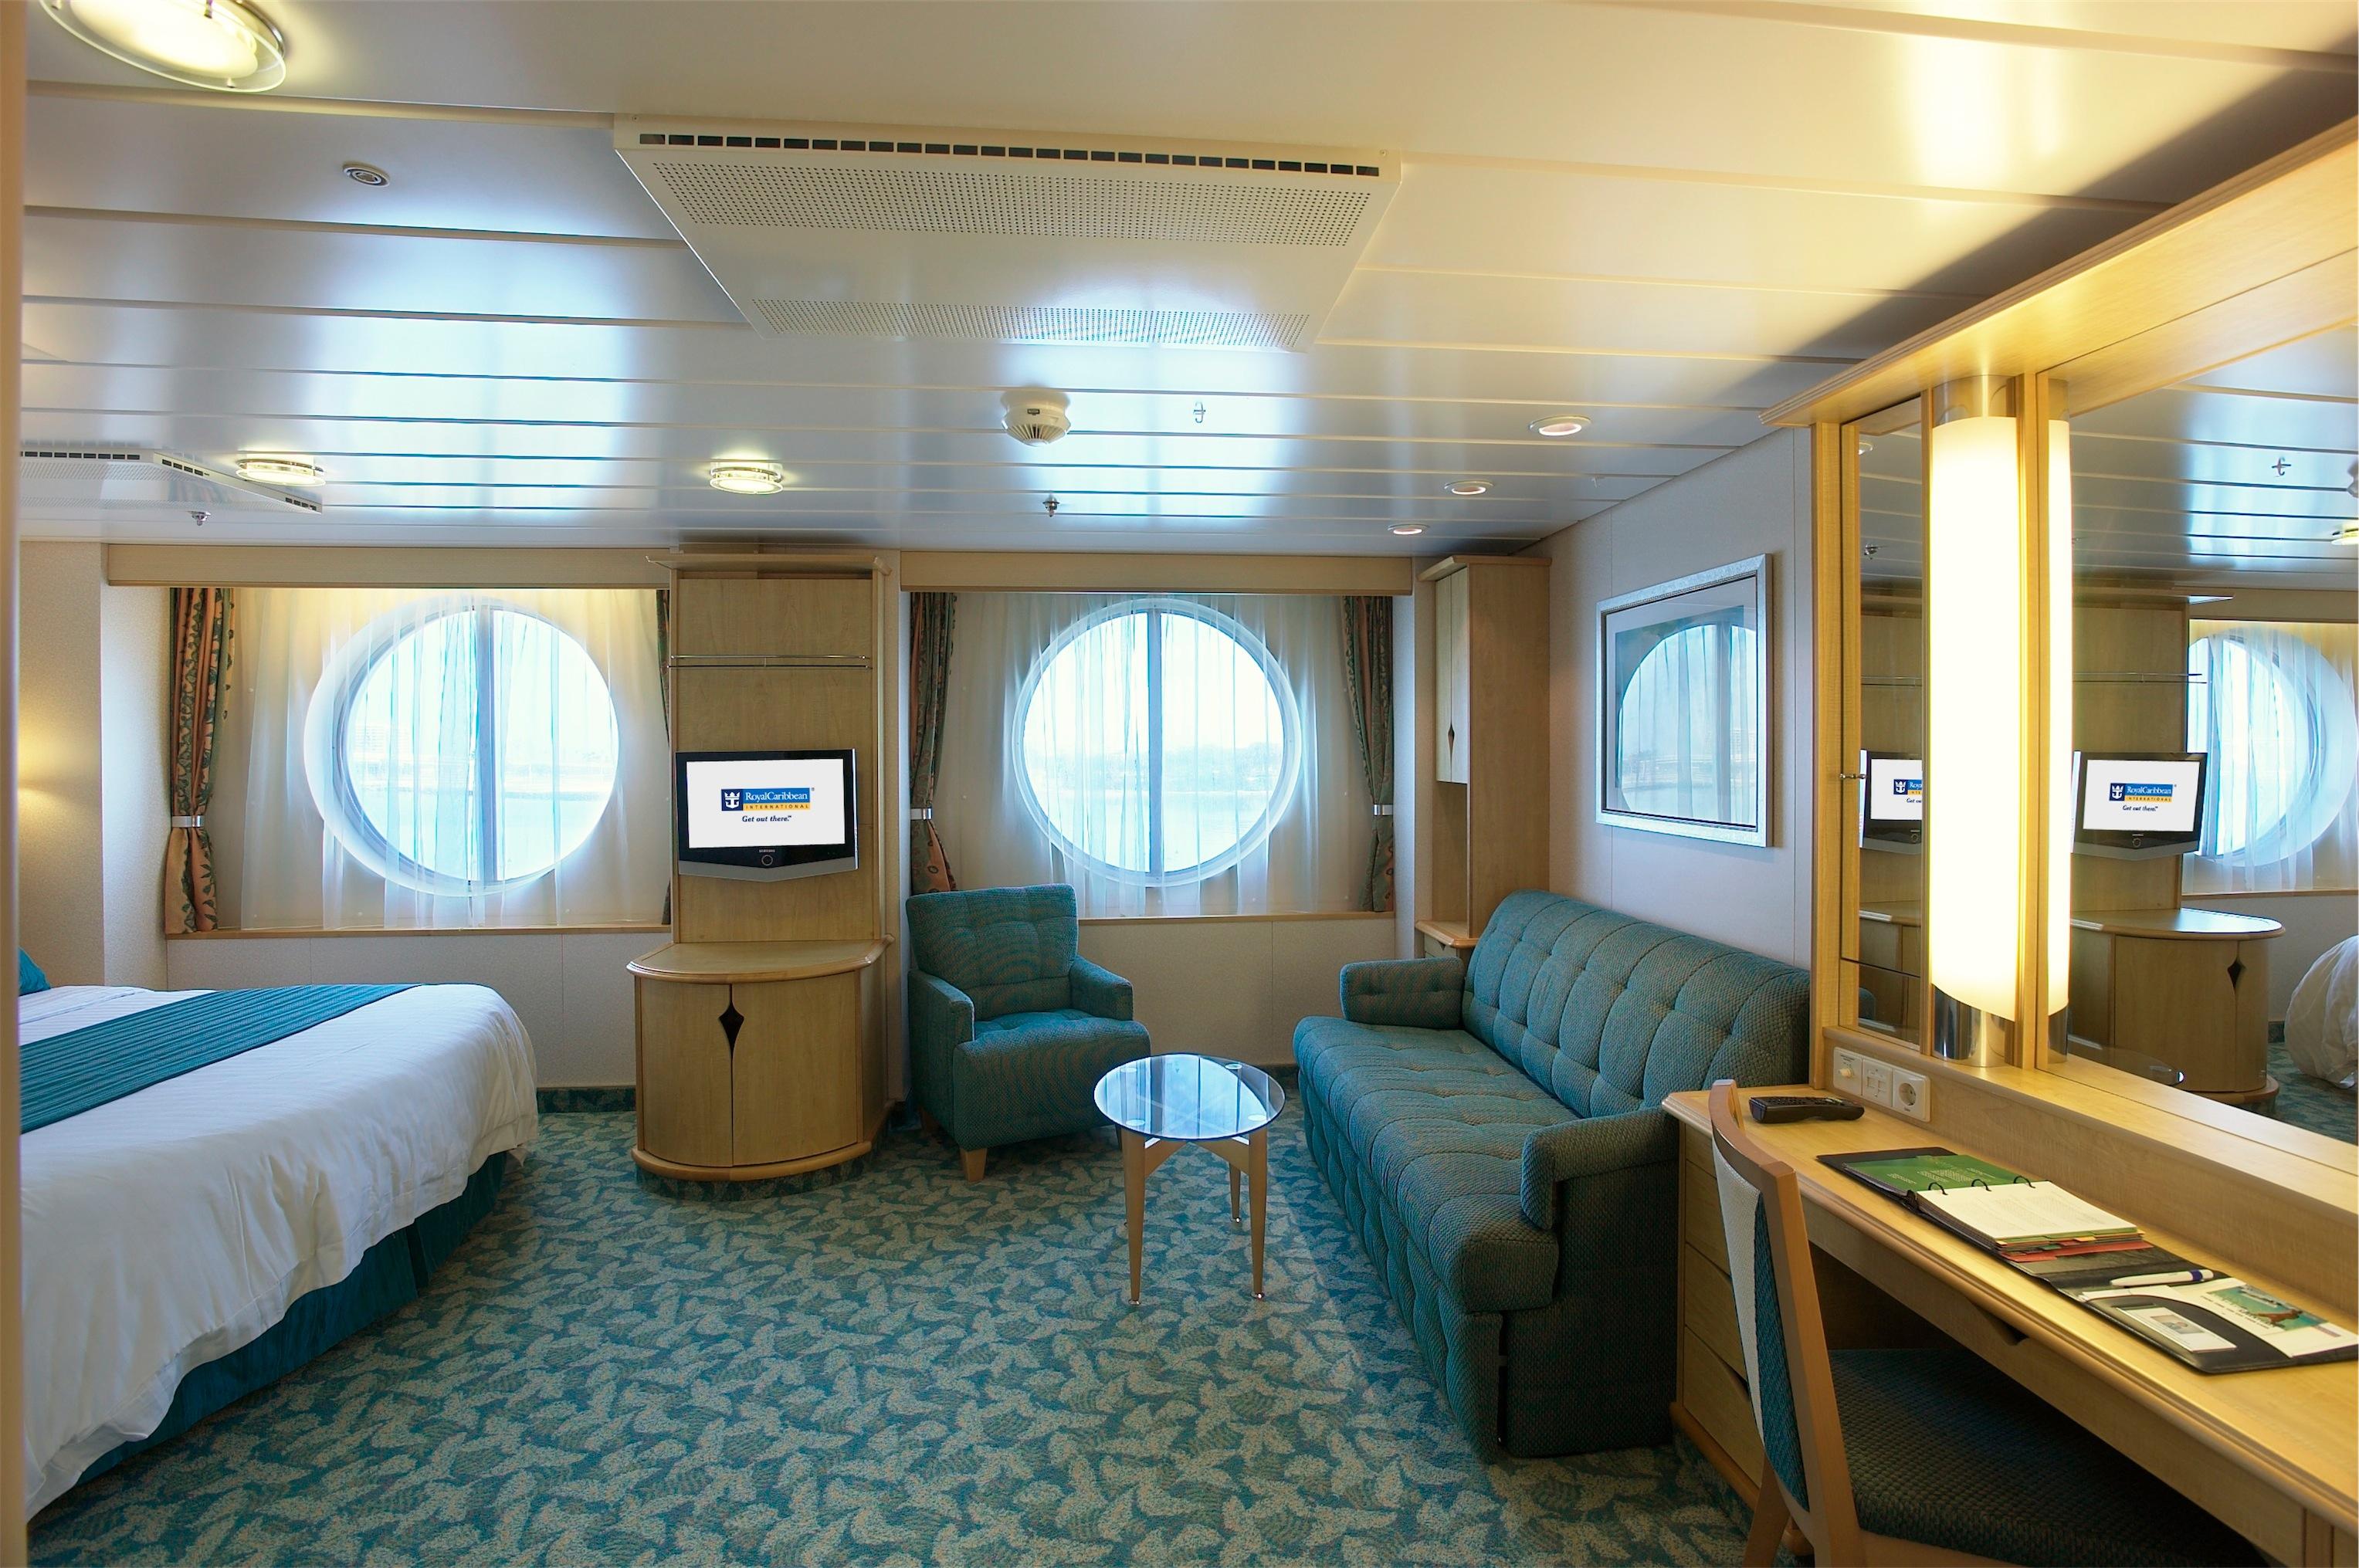 Royal Caribbean International Freedom of the Seas Accommodation Family Ocean View.jpg